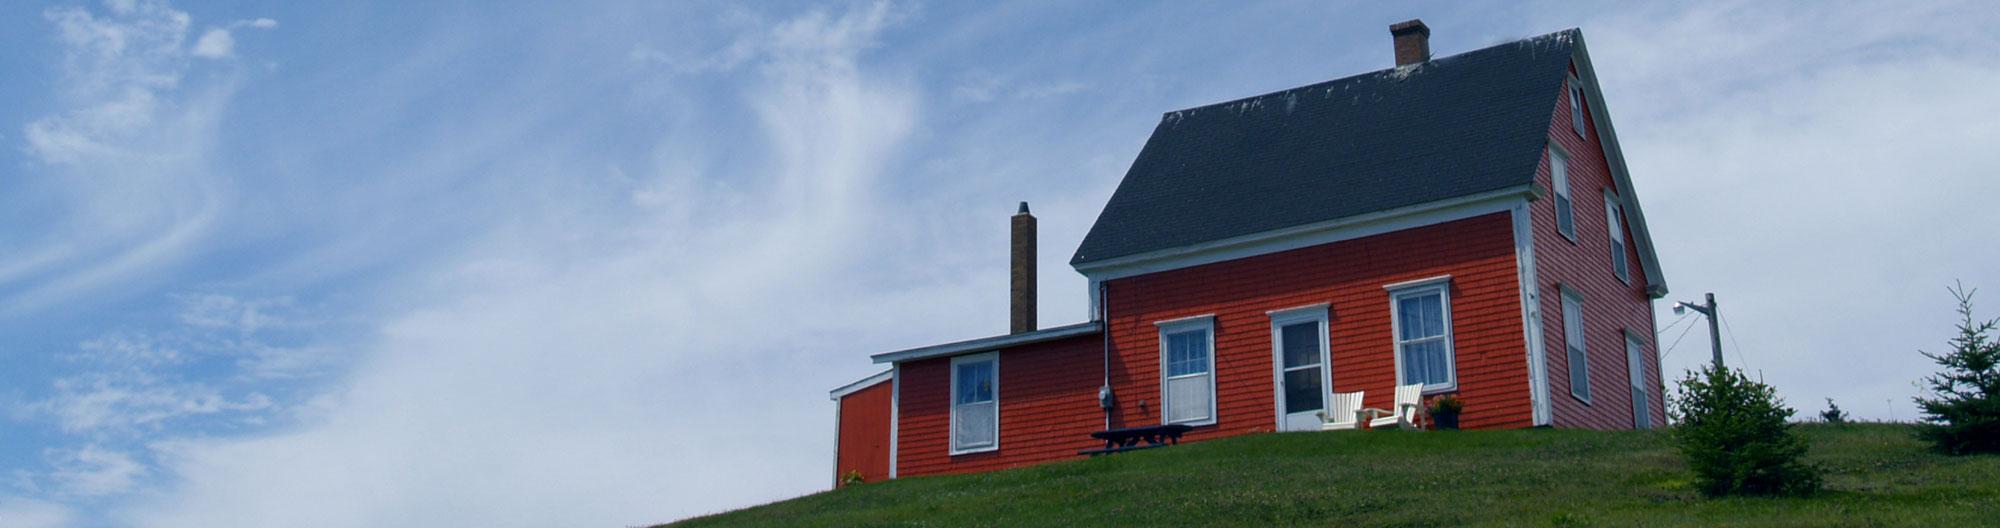 2019-2022 Nova Scotia Action Plan